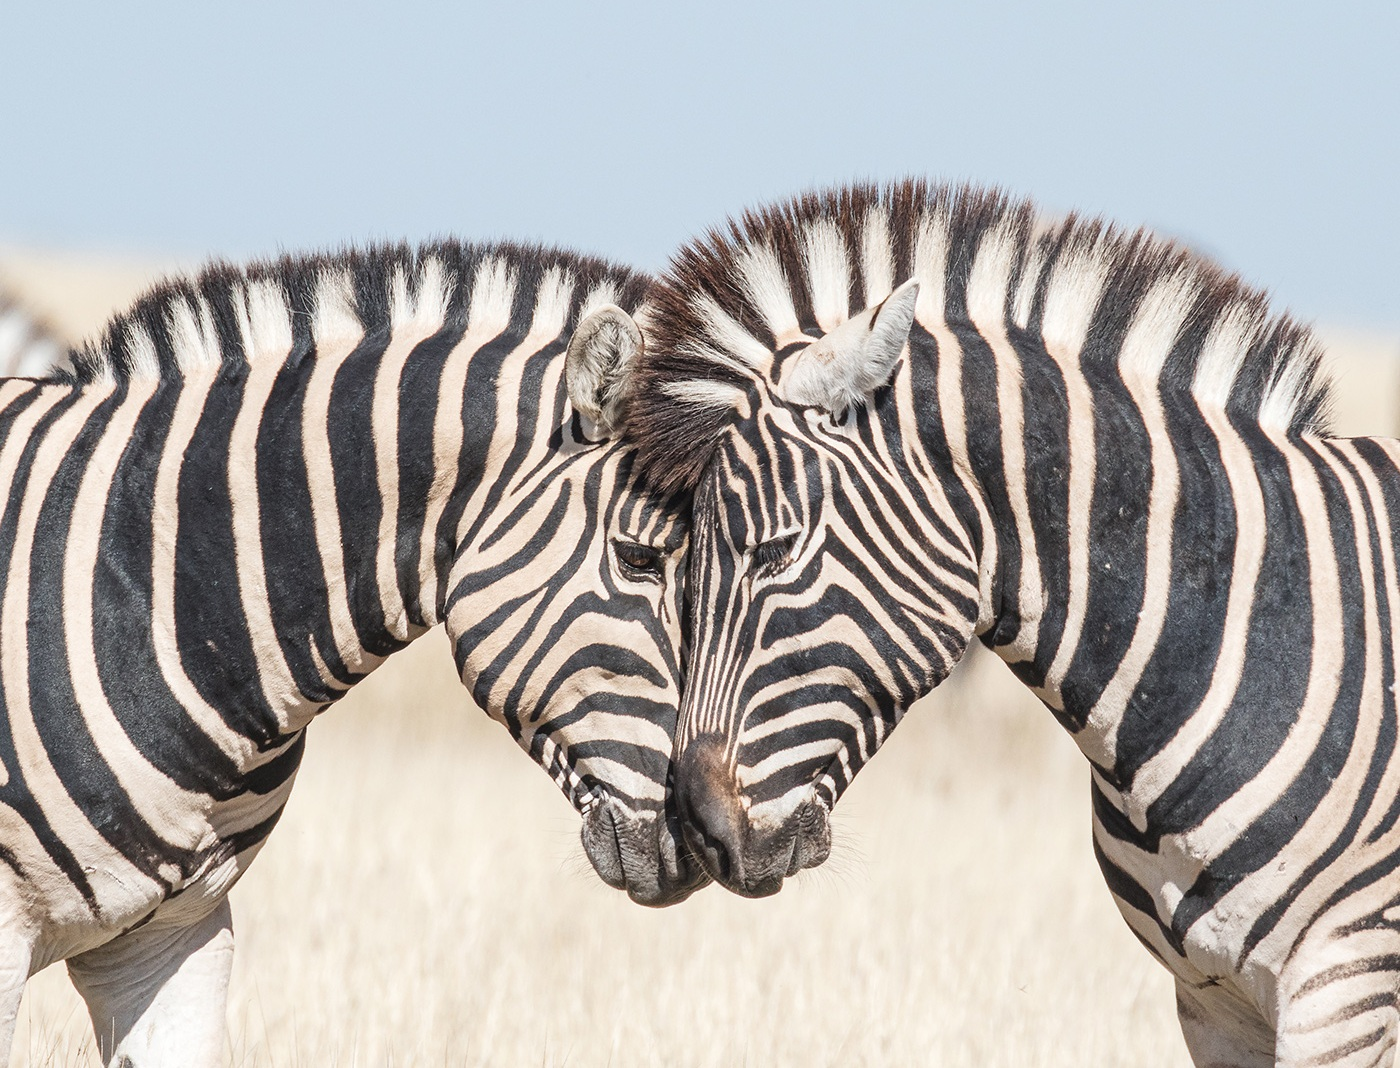 "Image copyright Catherine d'Alessio - ""Burchell's Zebras"""